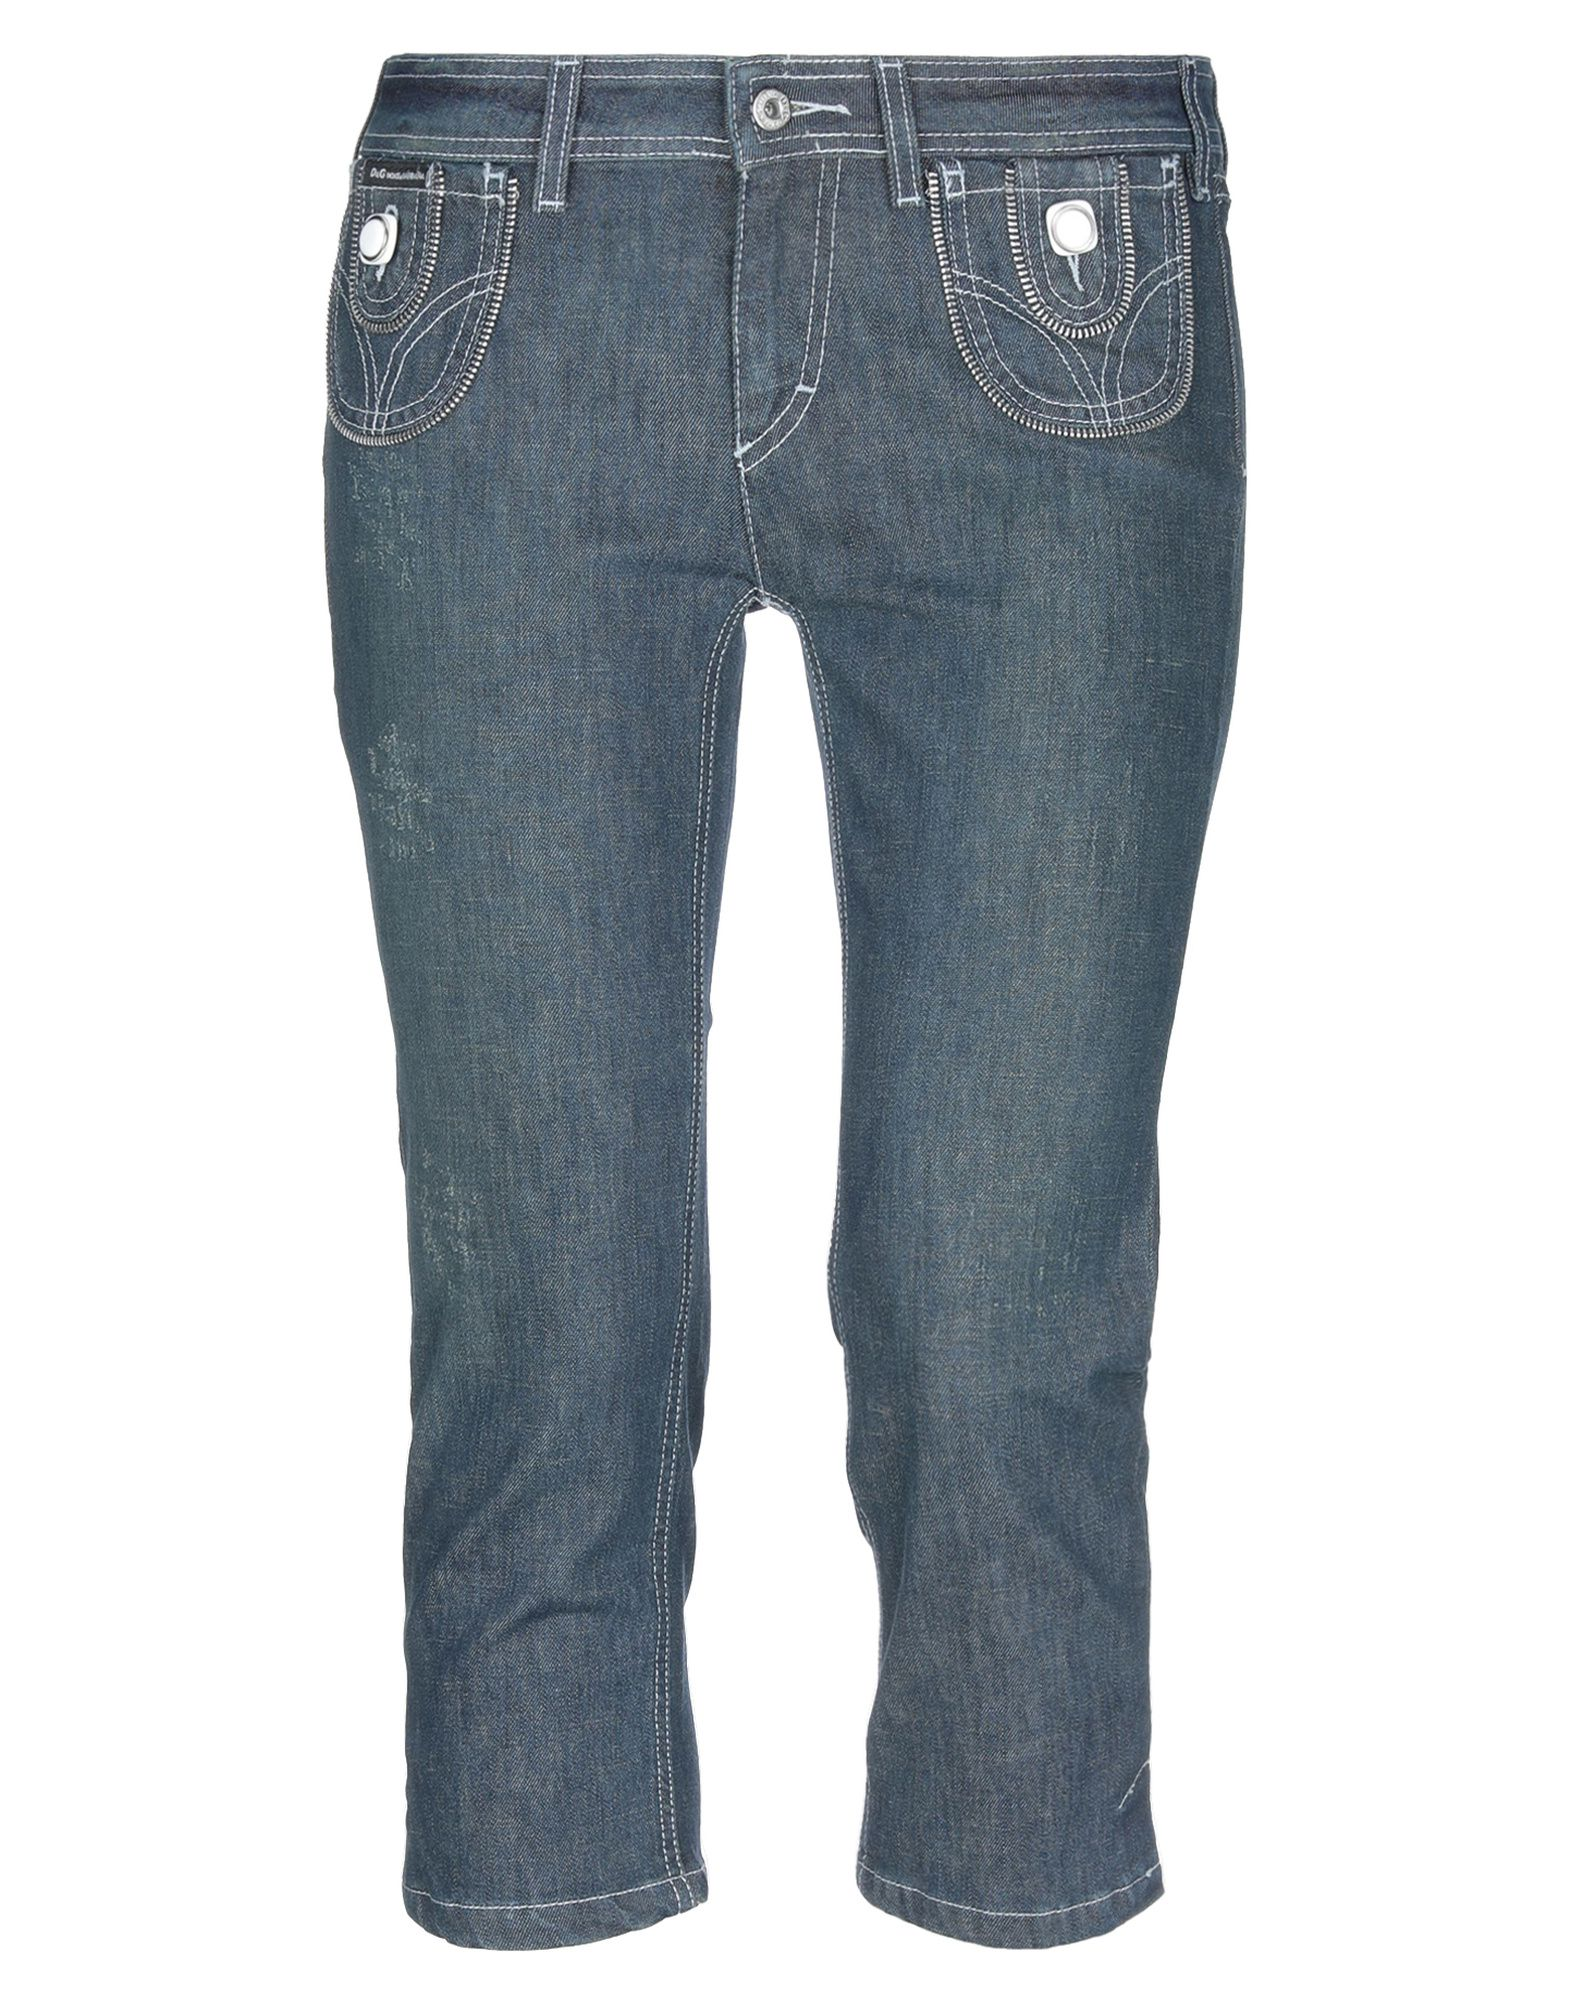 DOLCE & GABBANA Джинсовые брюки-капри